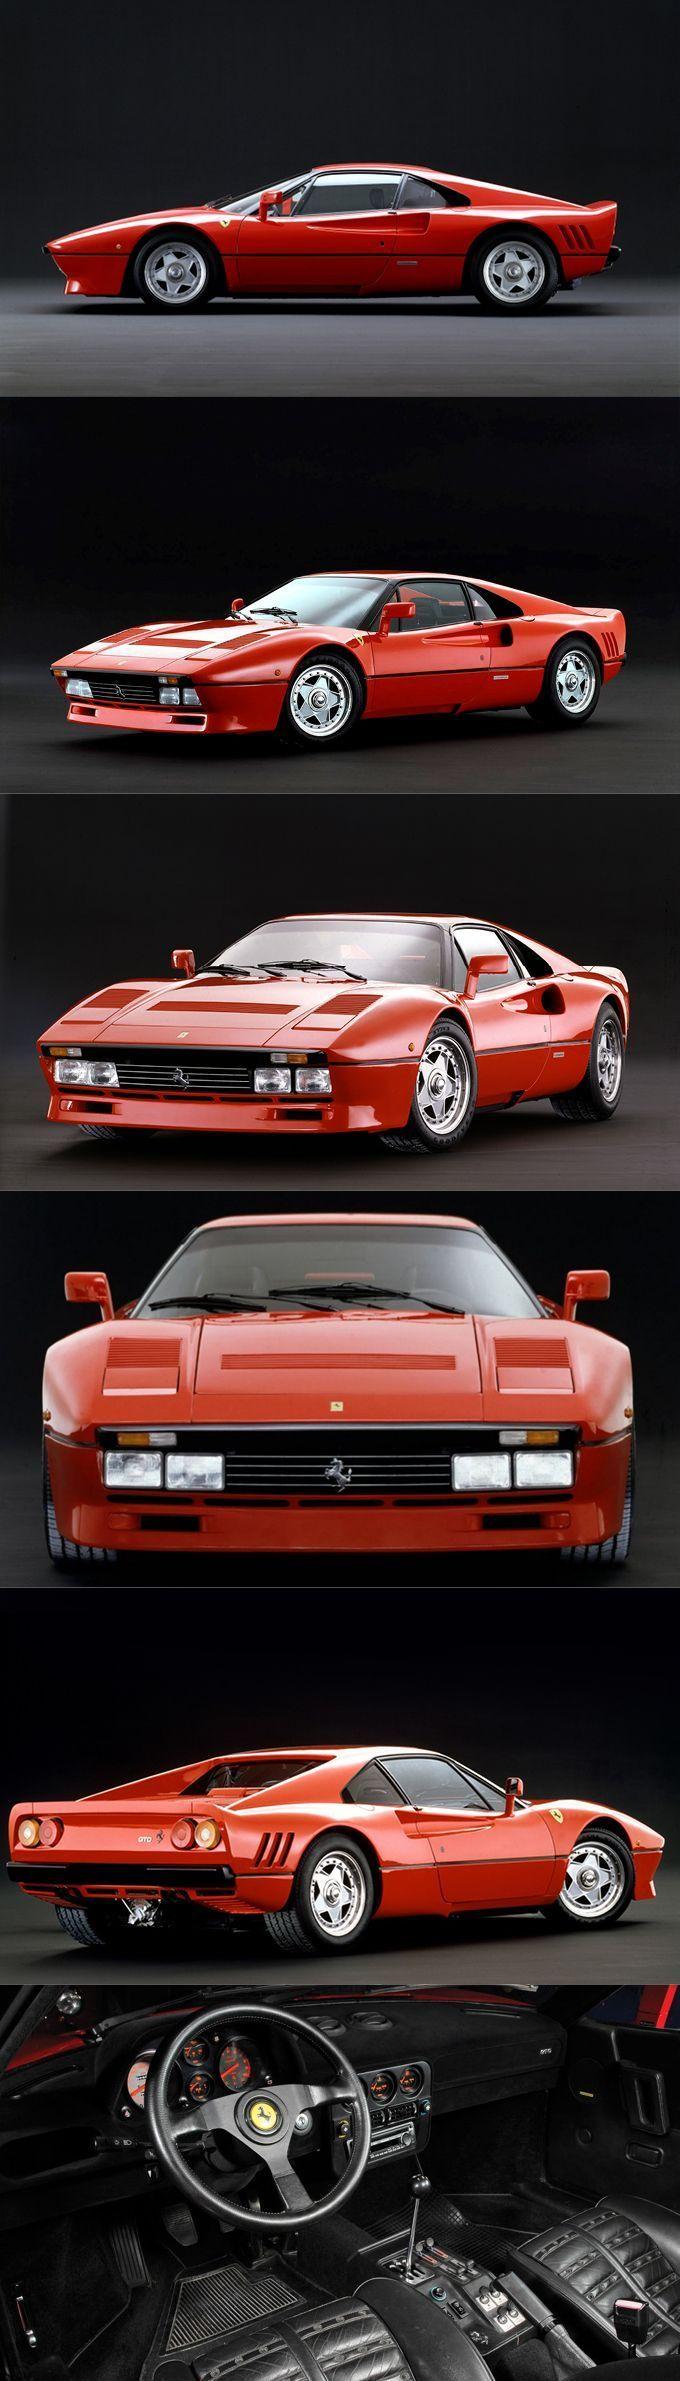 1984 #ferrari 288 GTO / Group B homologation / 272pcs / red / Italy / Leonardo Fioravanti @ Pininfarina / 16-172